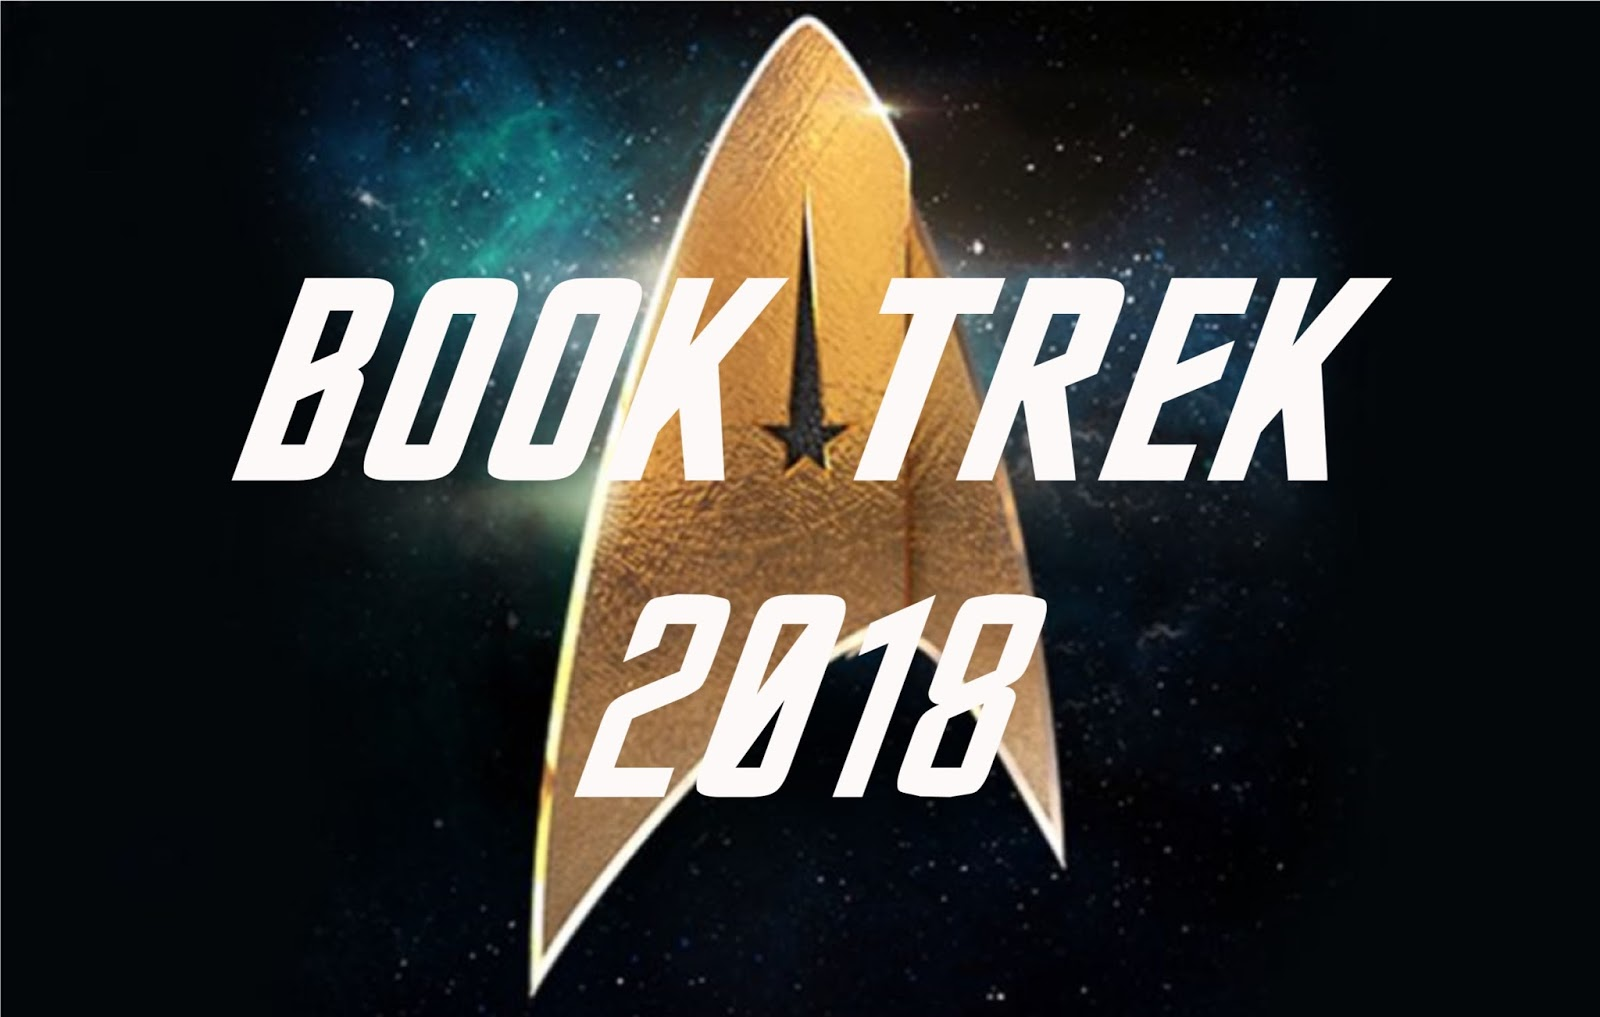 BOOK TREK 2018